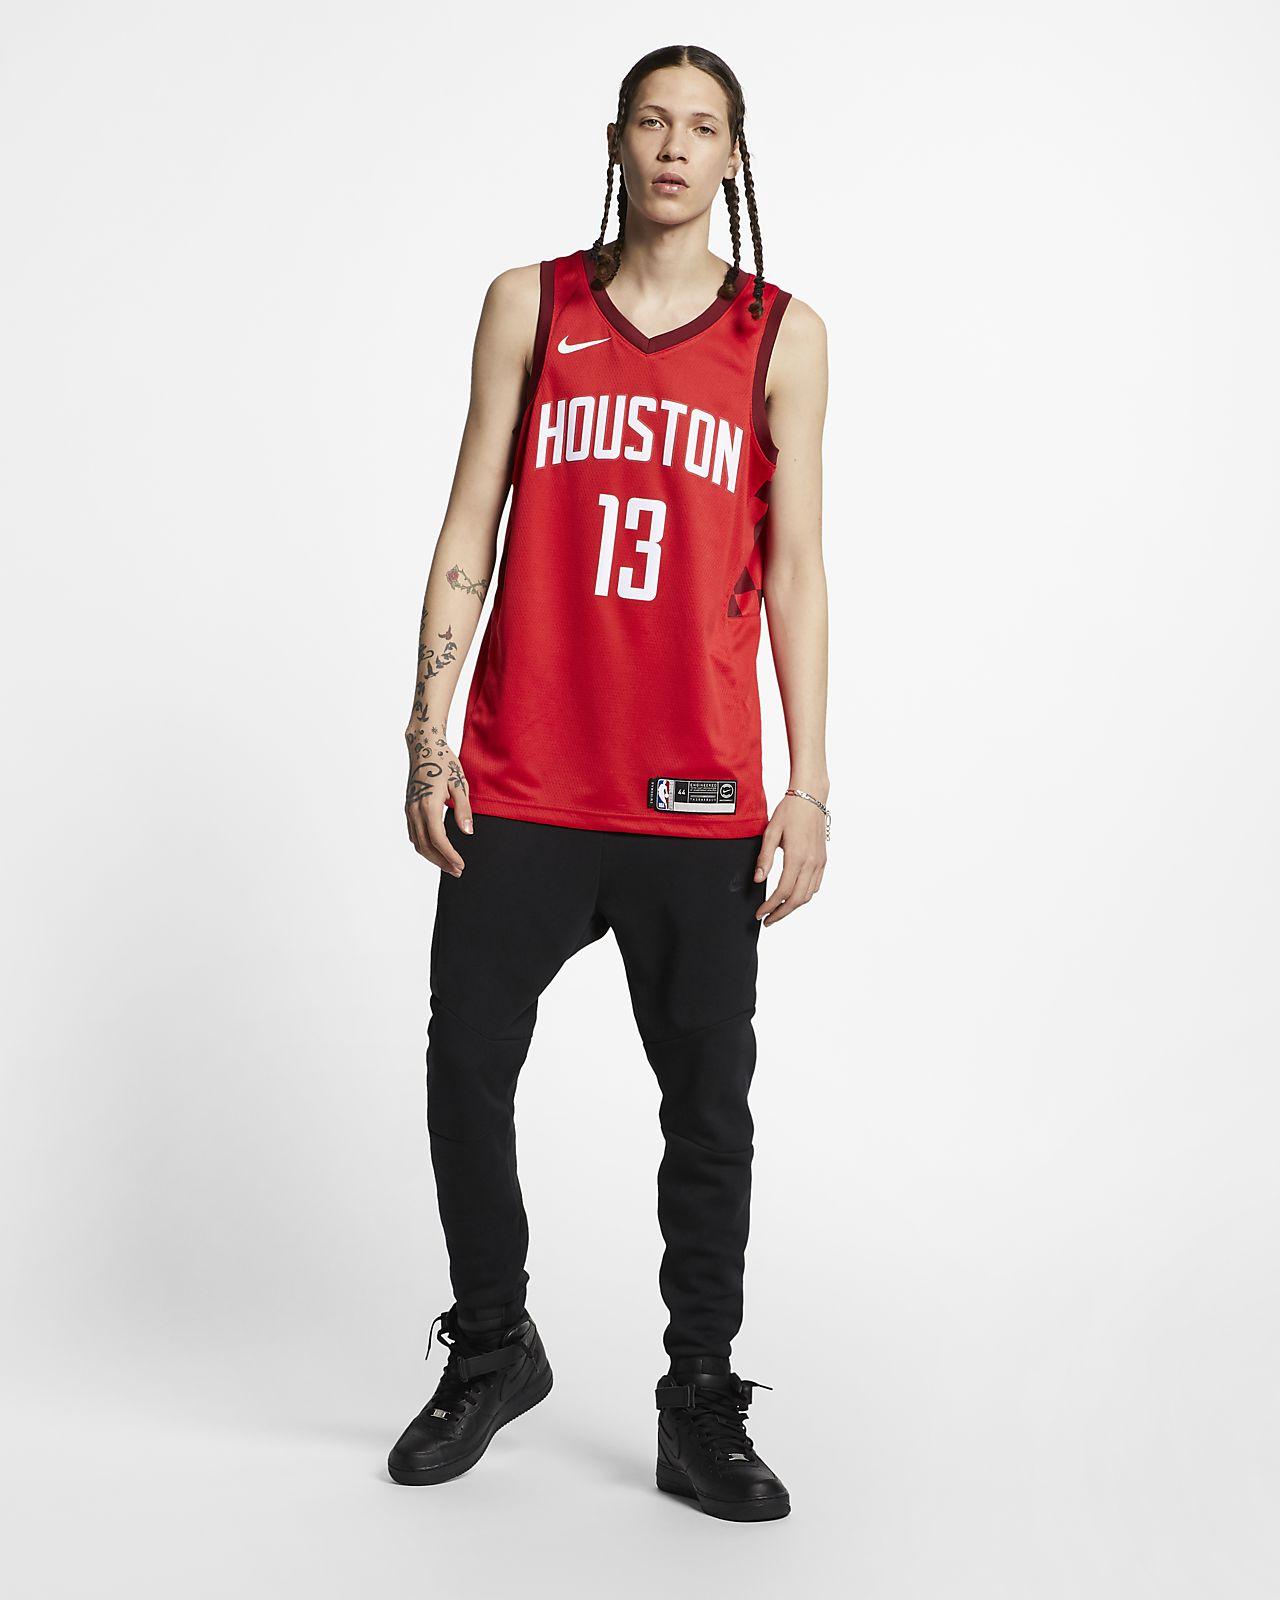 premium selection 5213f 912af ... James Harden Earned City Edition Swingman (Houston Rockets) Men s Nike  NBA Connected Jersey